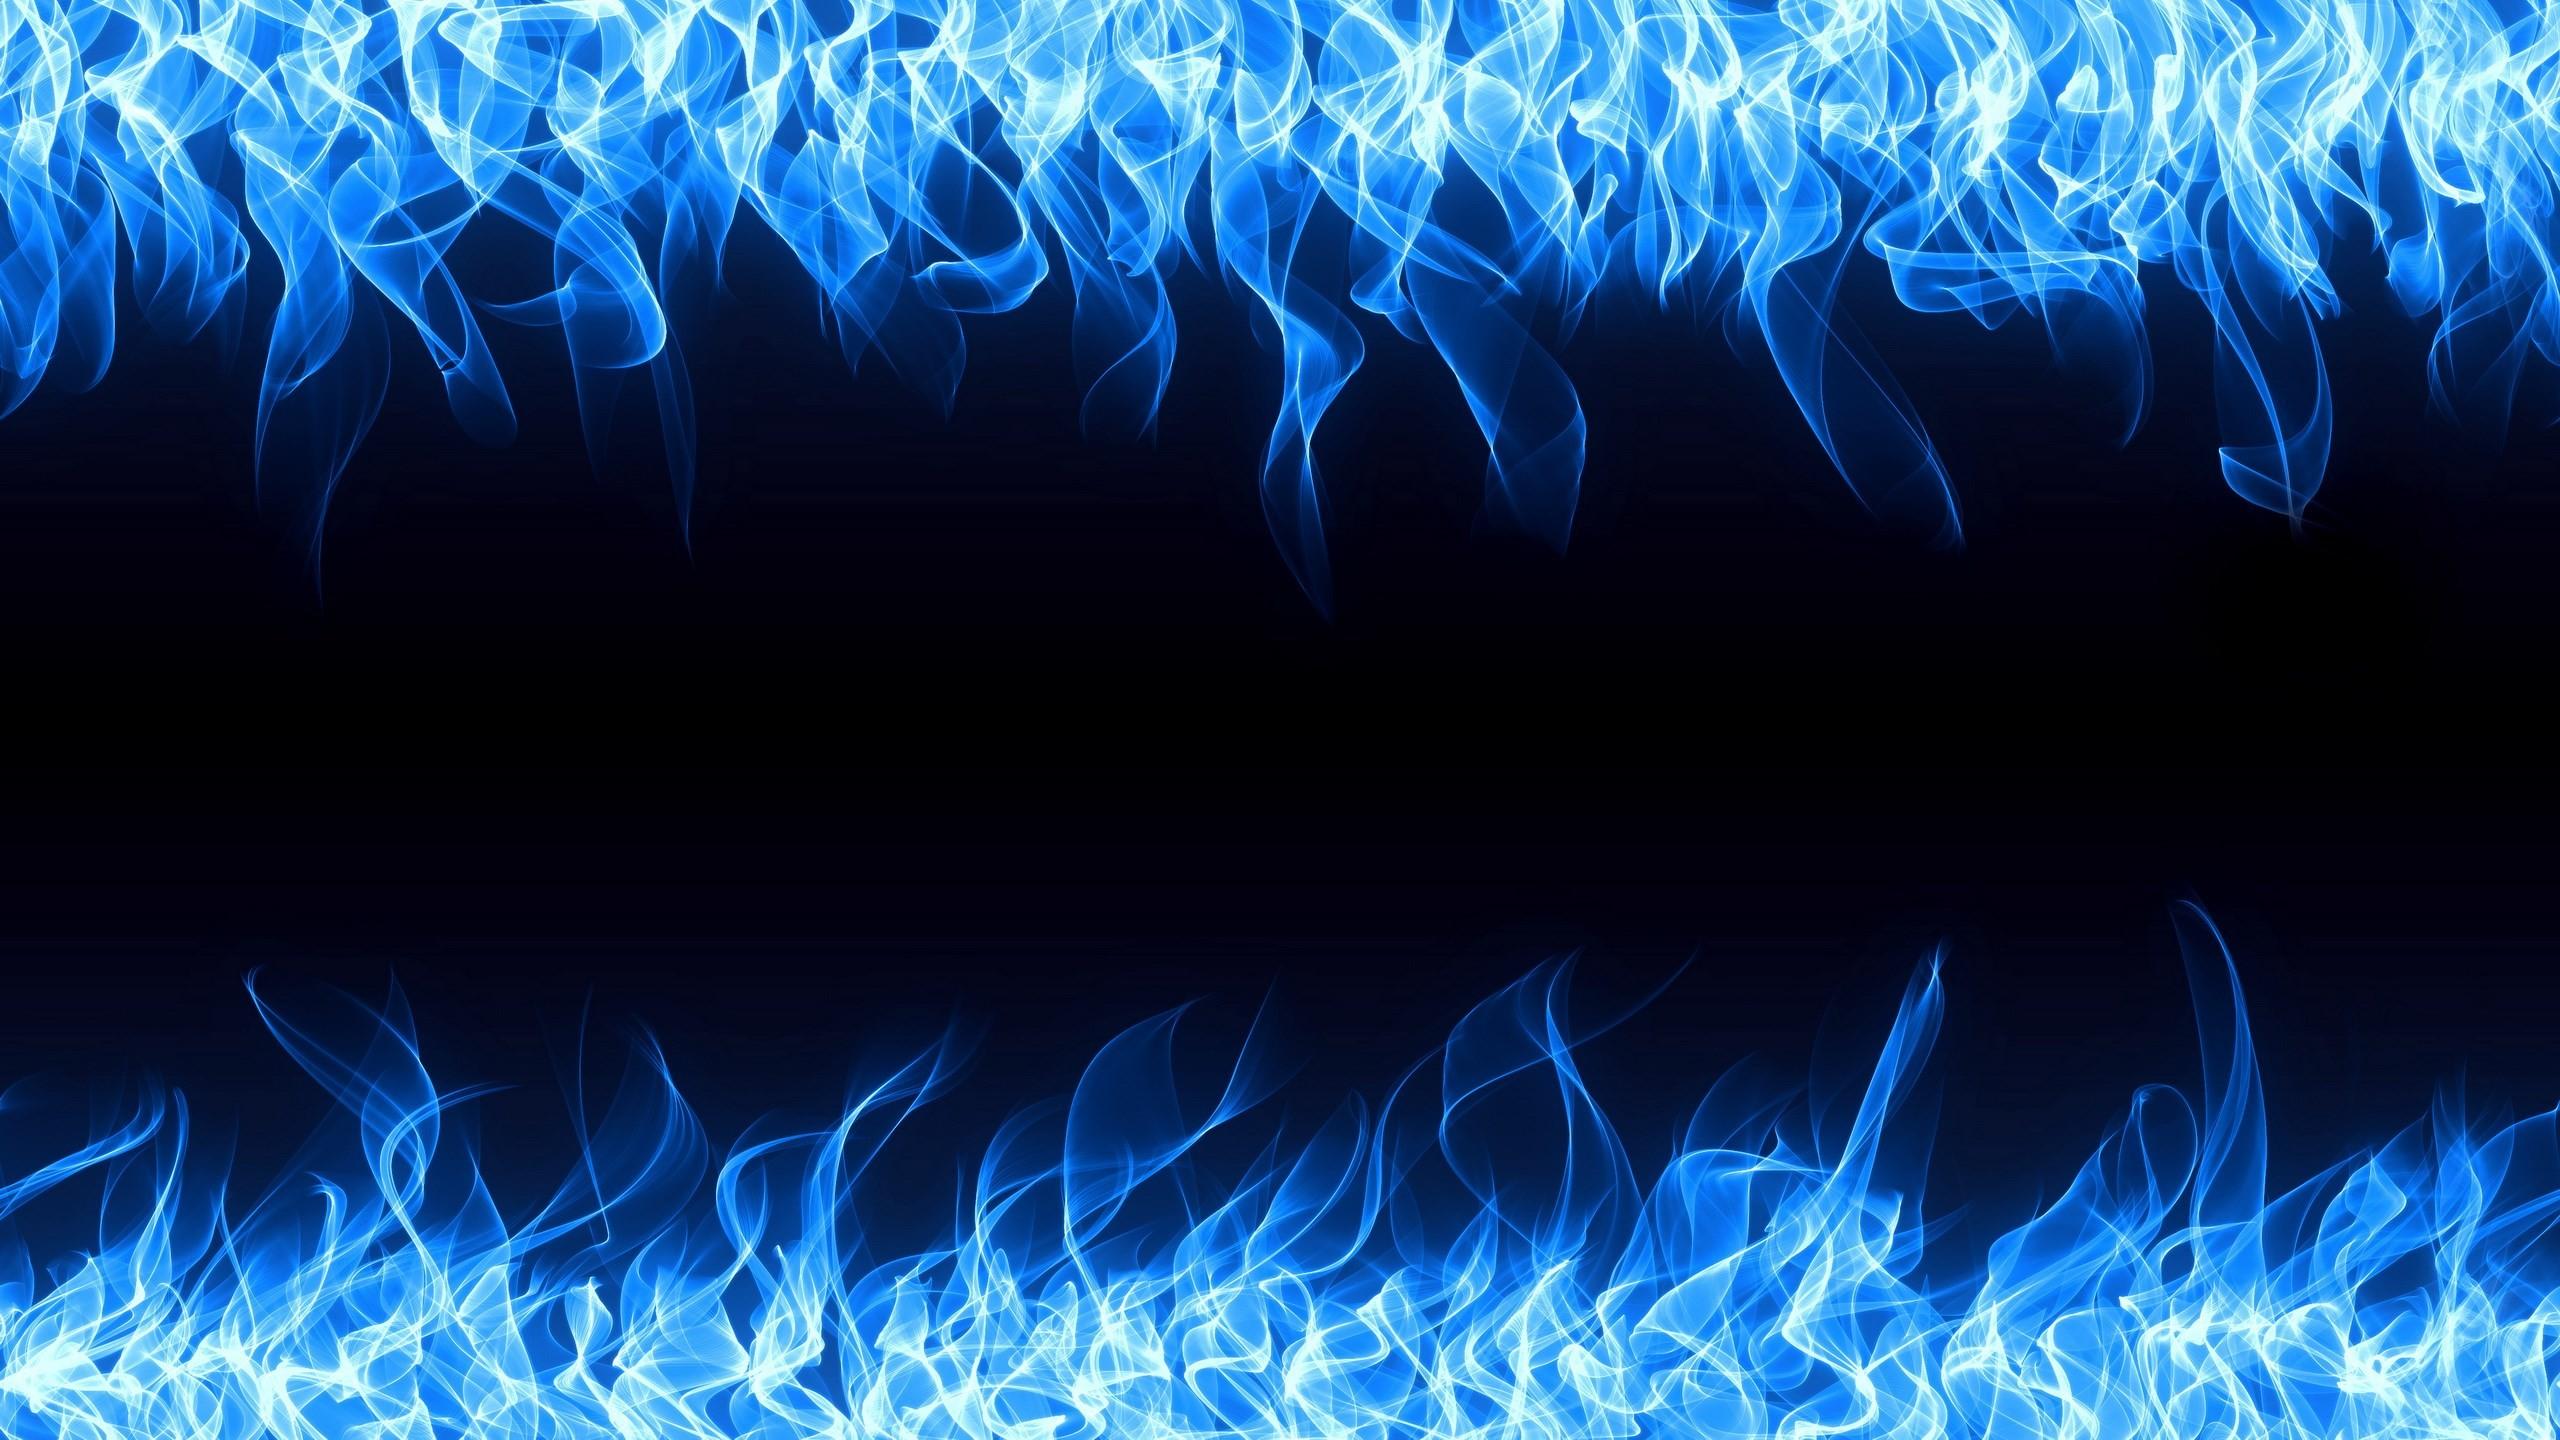 Blue Flame Wallpaper 1